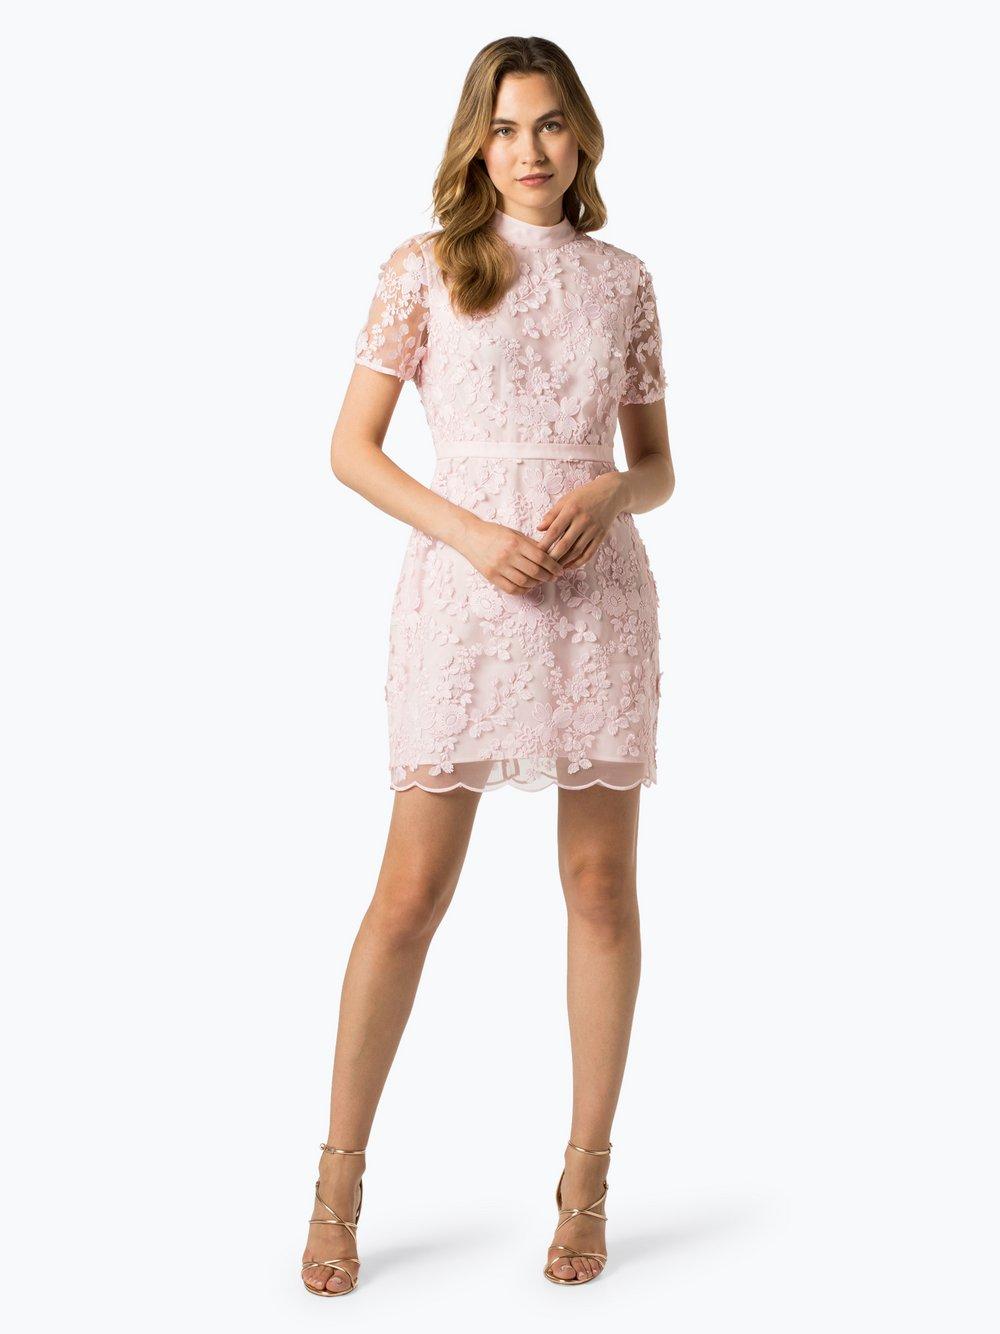 Ted Baker - Sukienka damska – Adriya, różowy